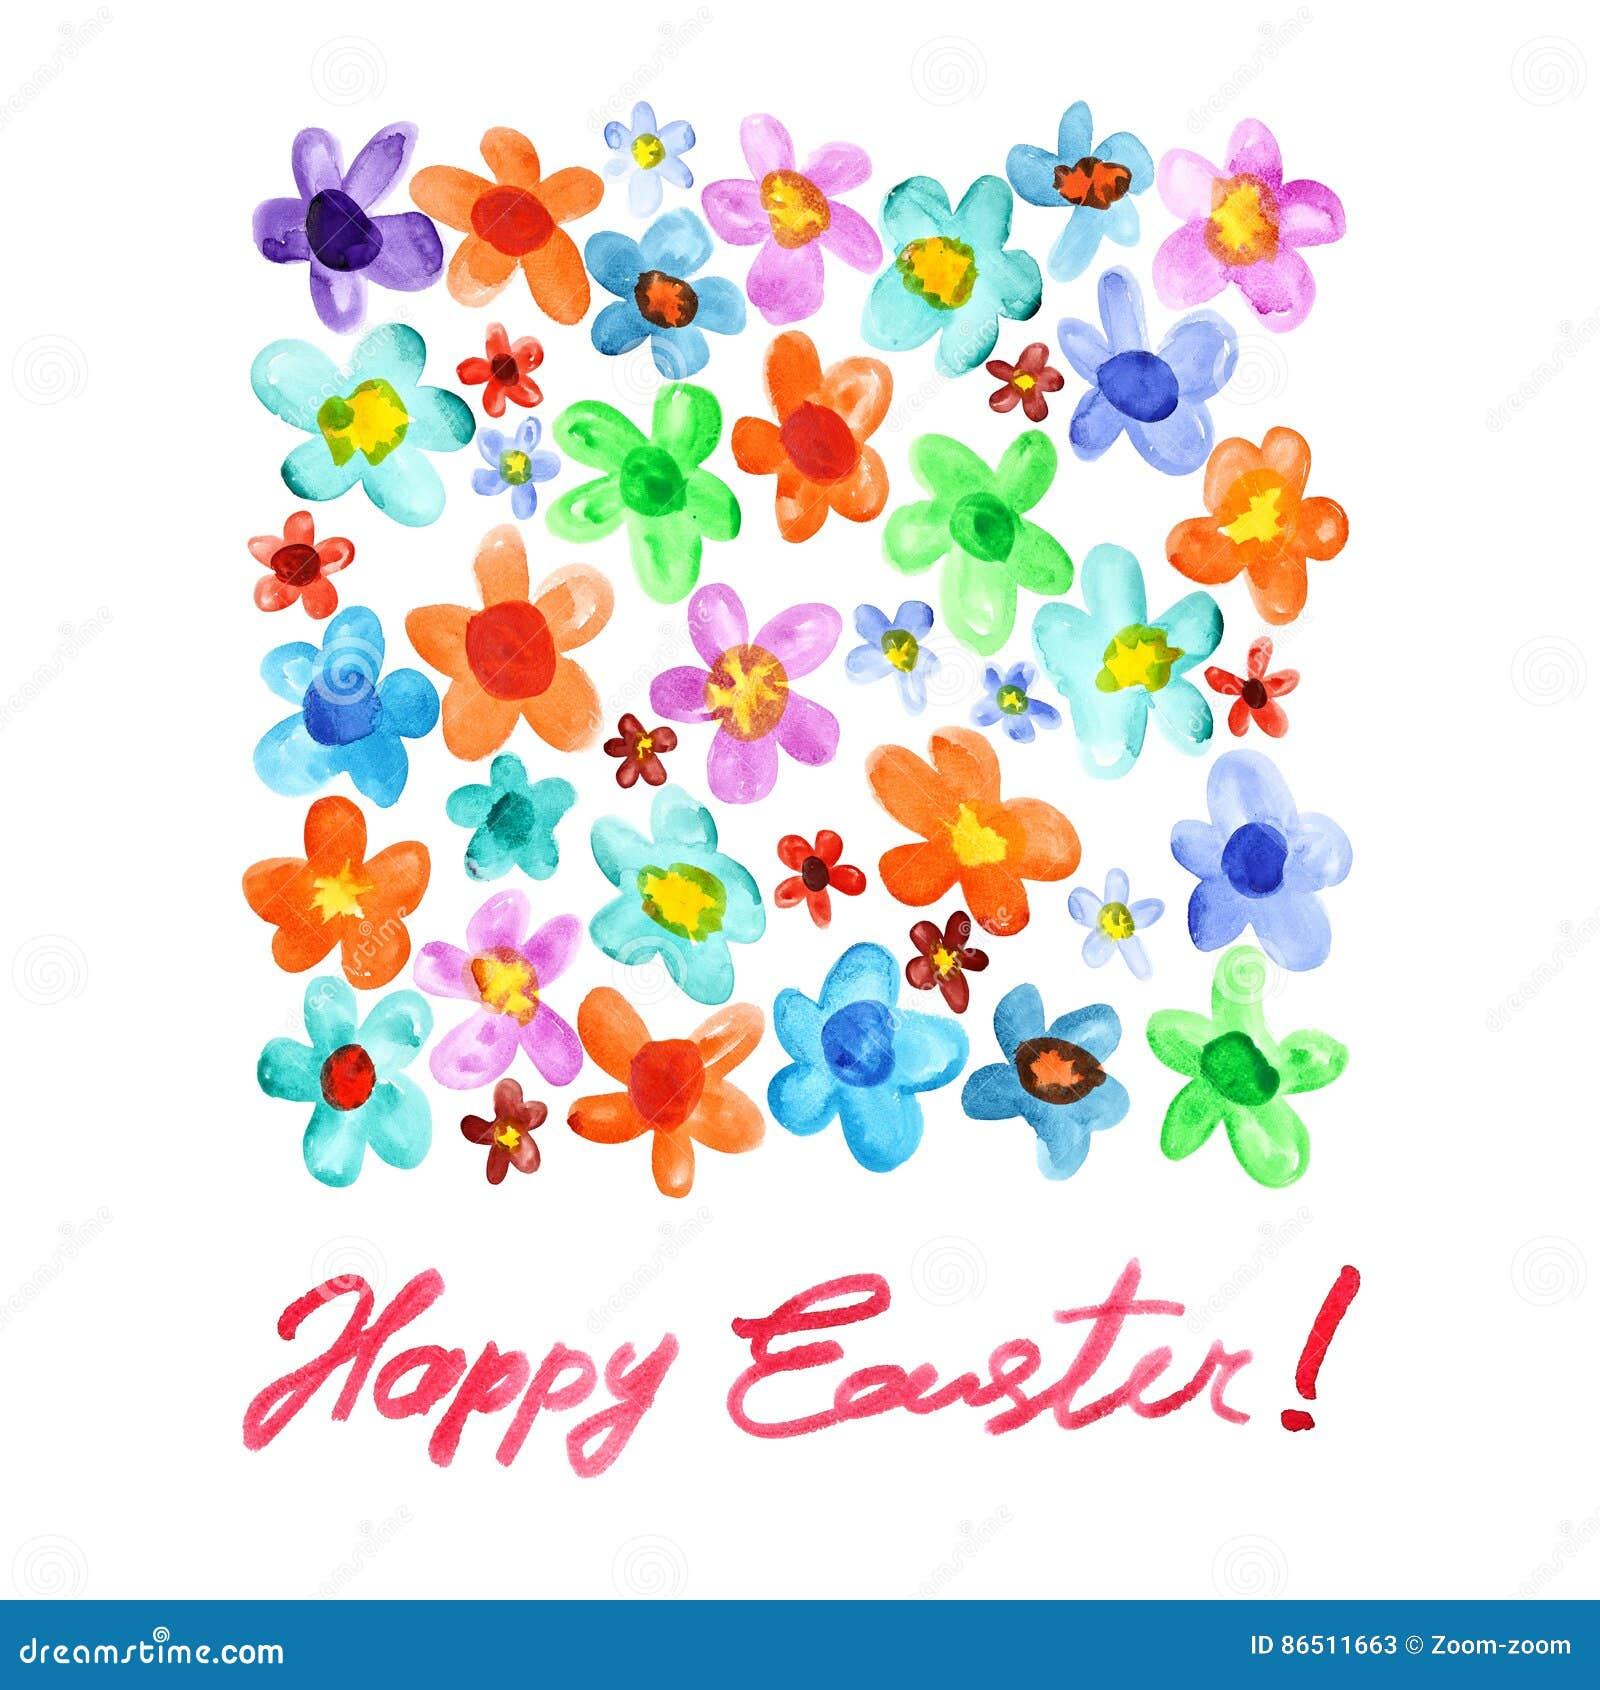 Fröhliche Ostern - Aquarellblumen